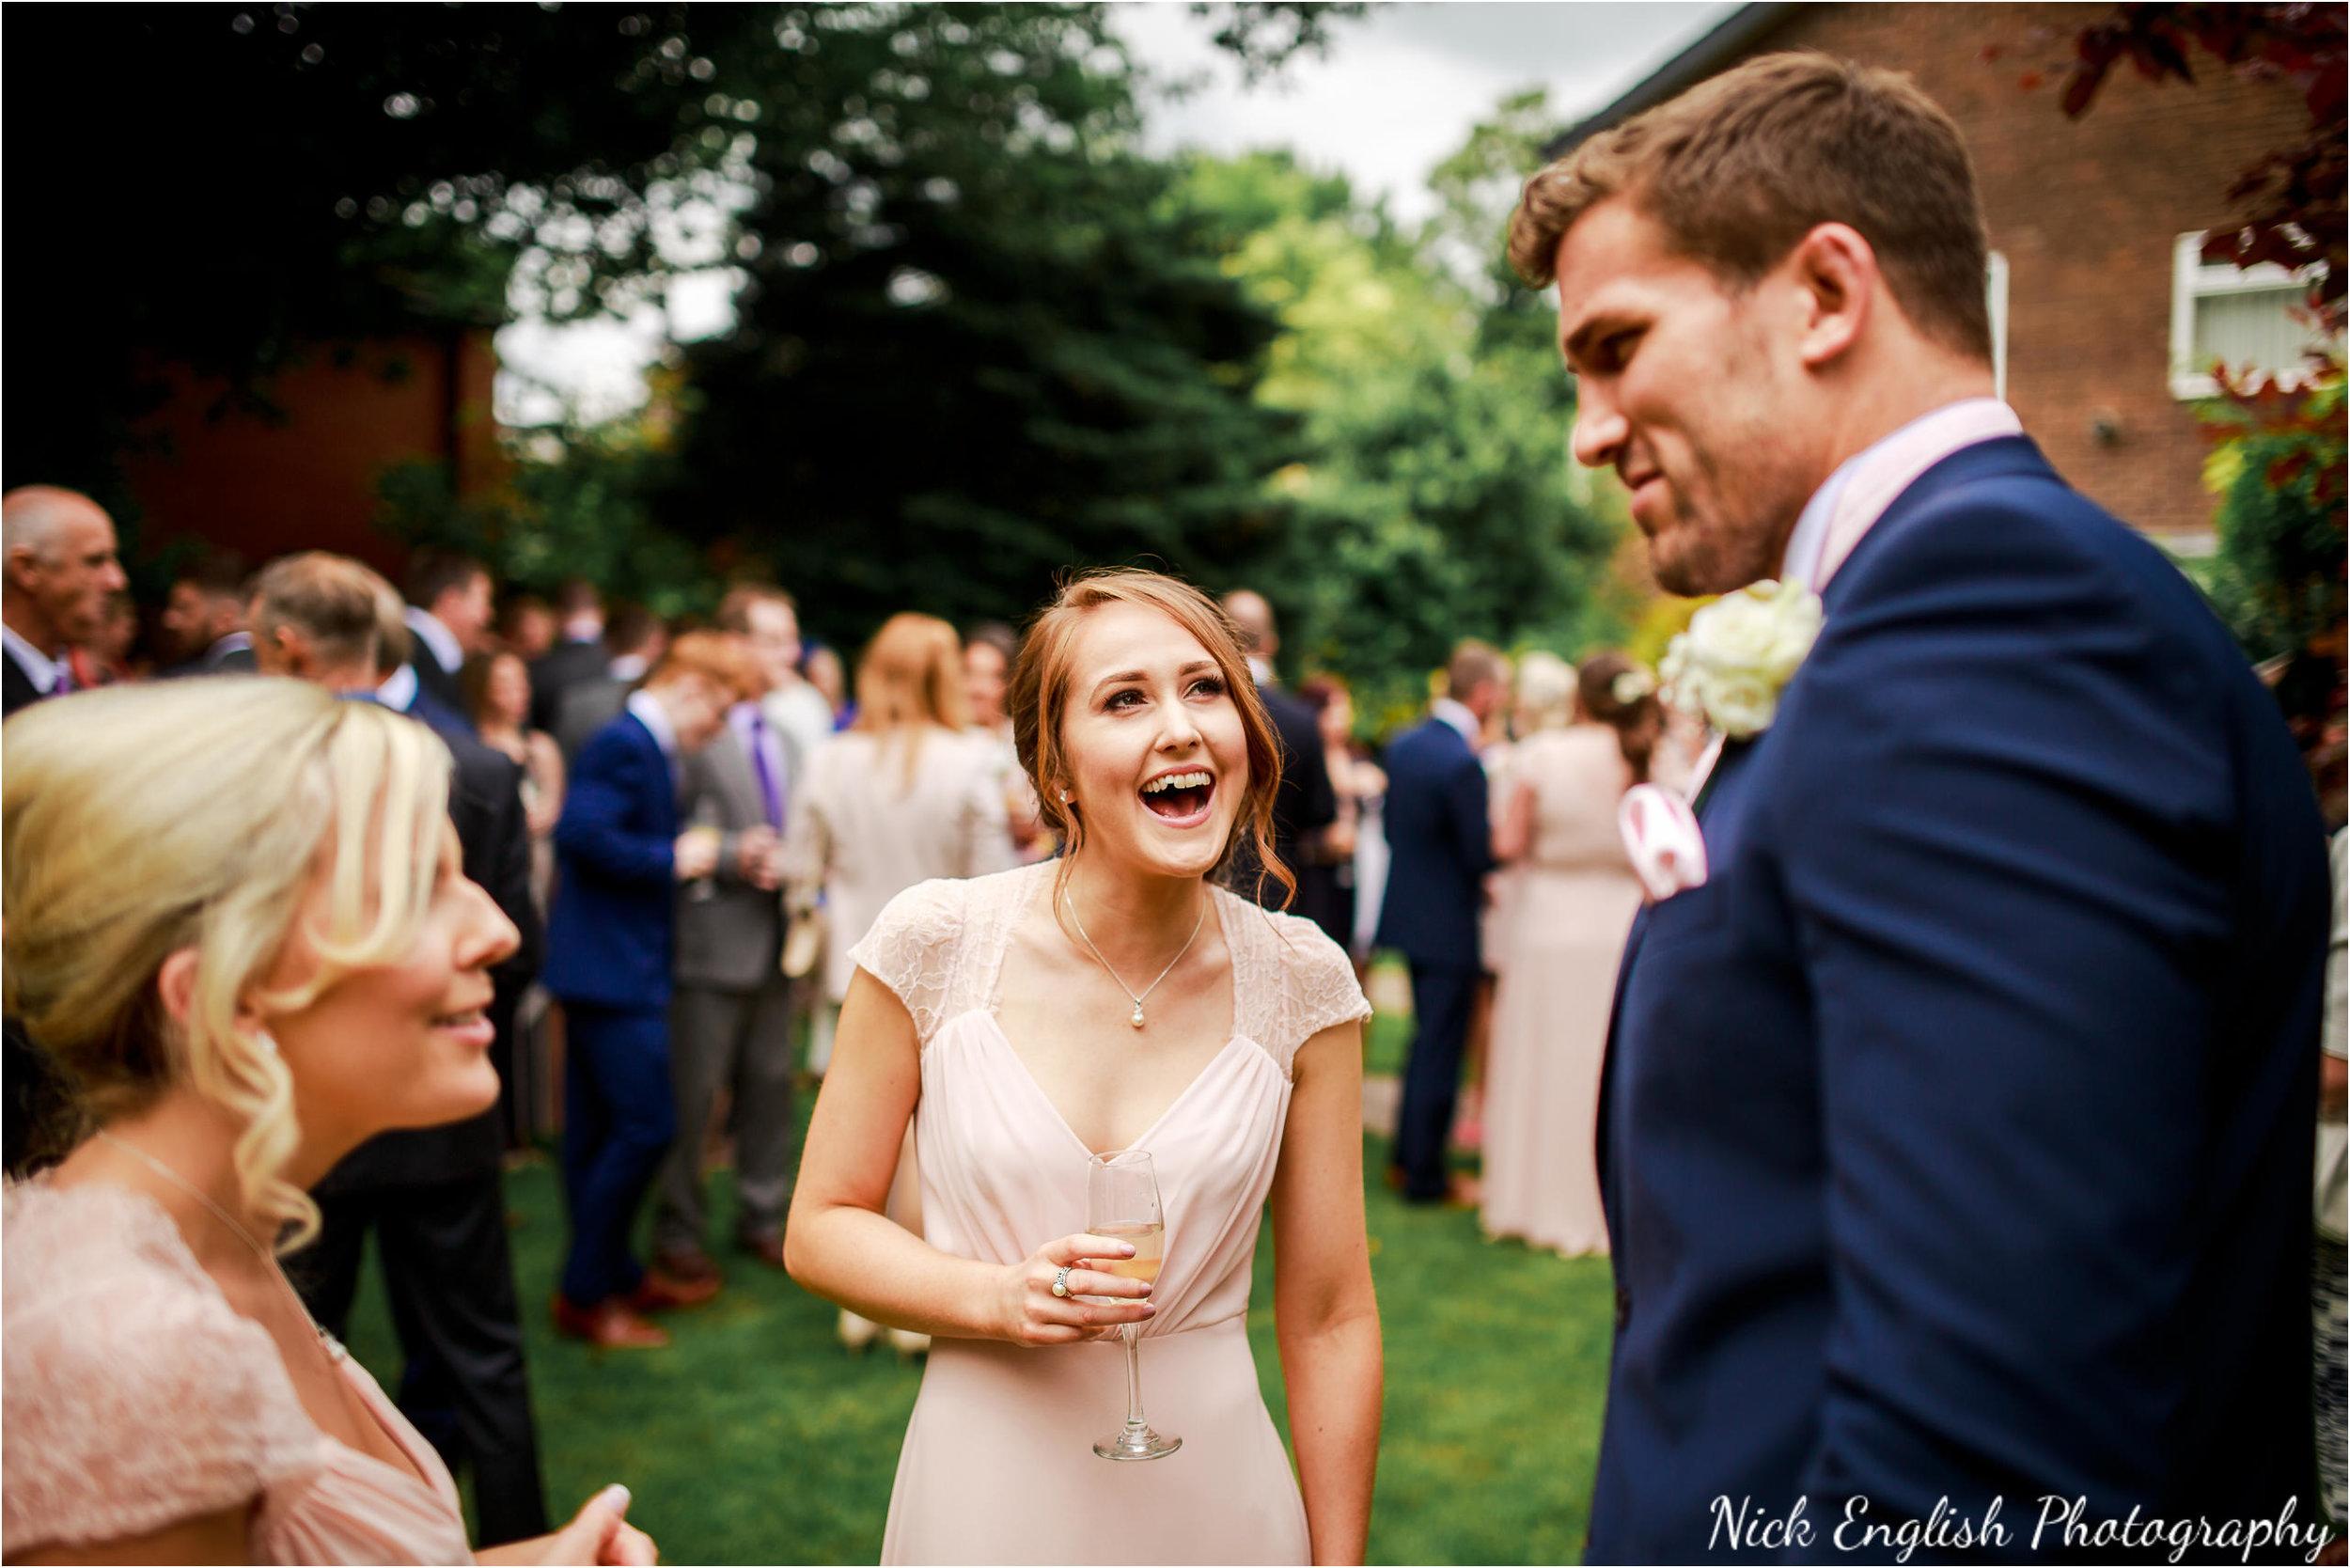 Emily David Wedding Photographs at Barton Grange Preston by Nick English Photography 117jpg.jpeg